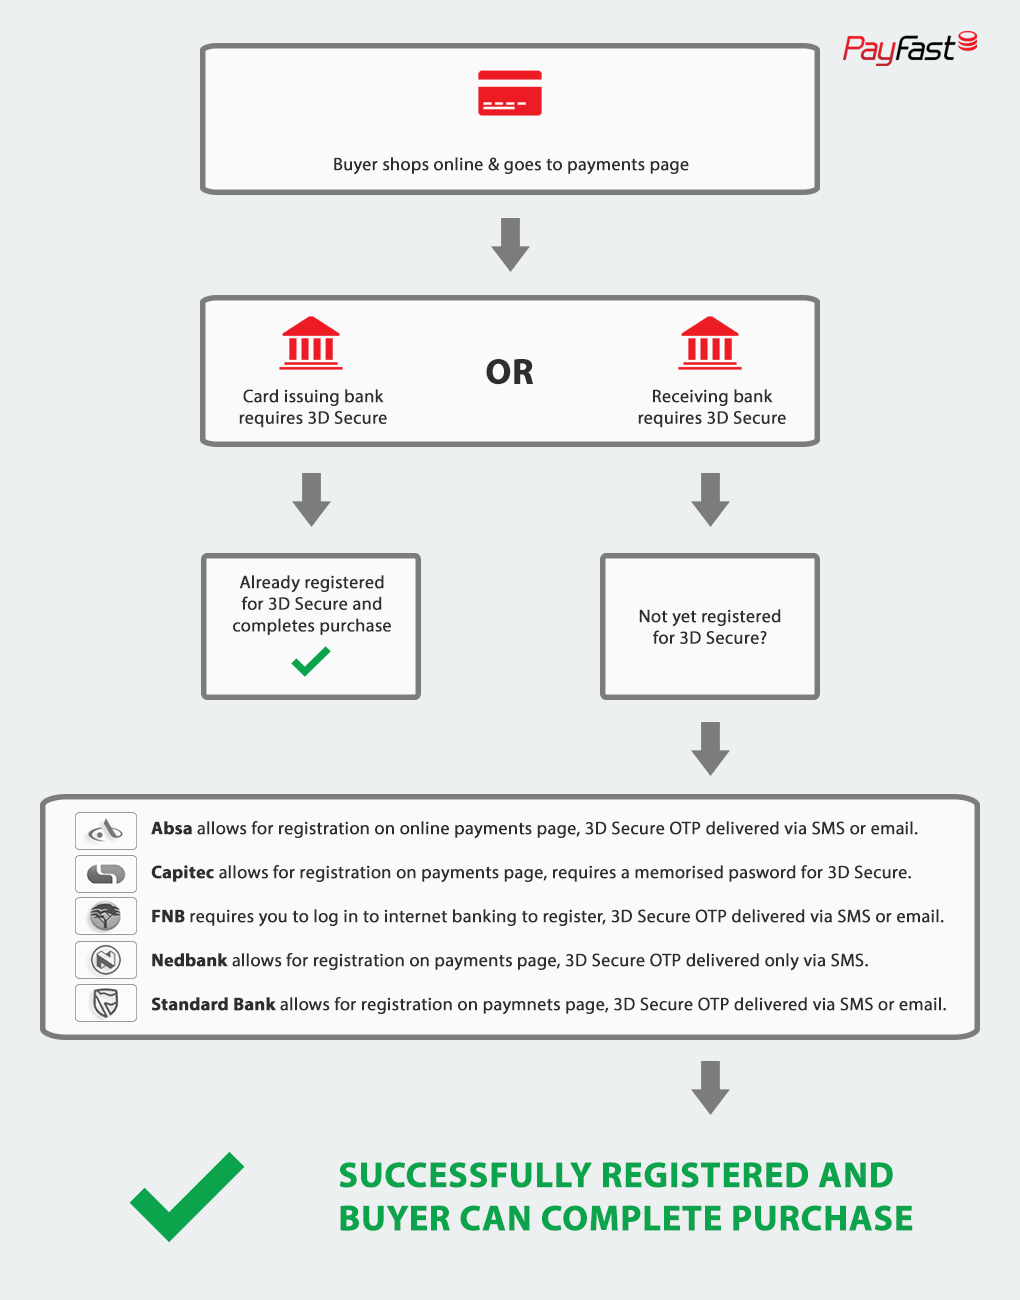 How do I register for 3D Secure? - PayFast